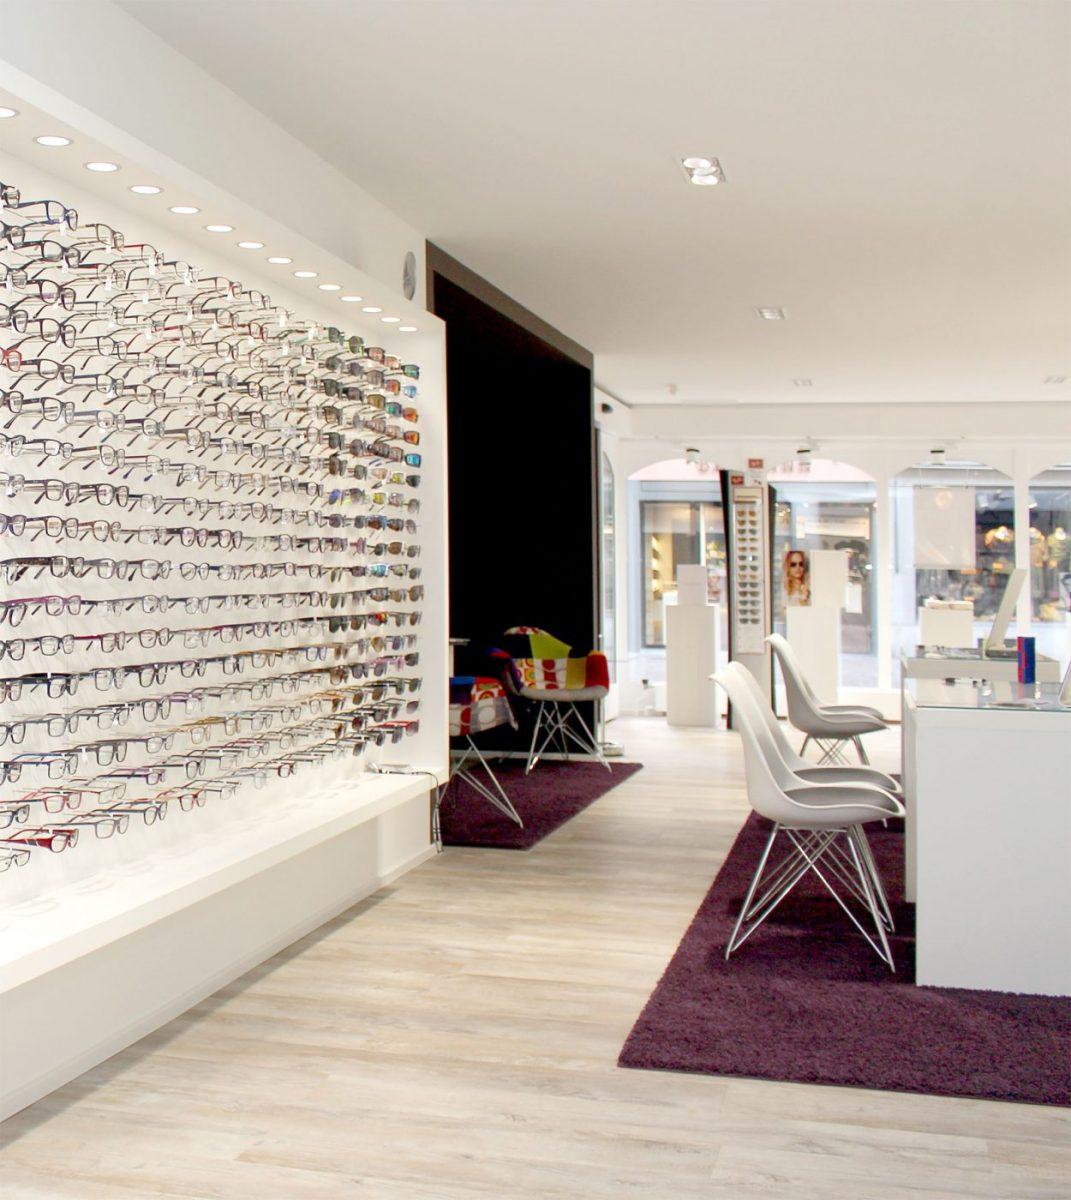 Schuster Innenausbau aus Salach – Ladenplanung Optik